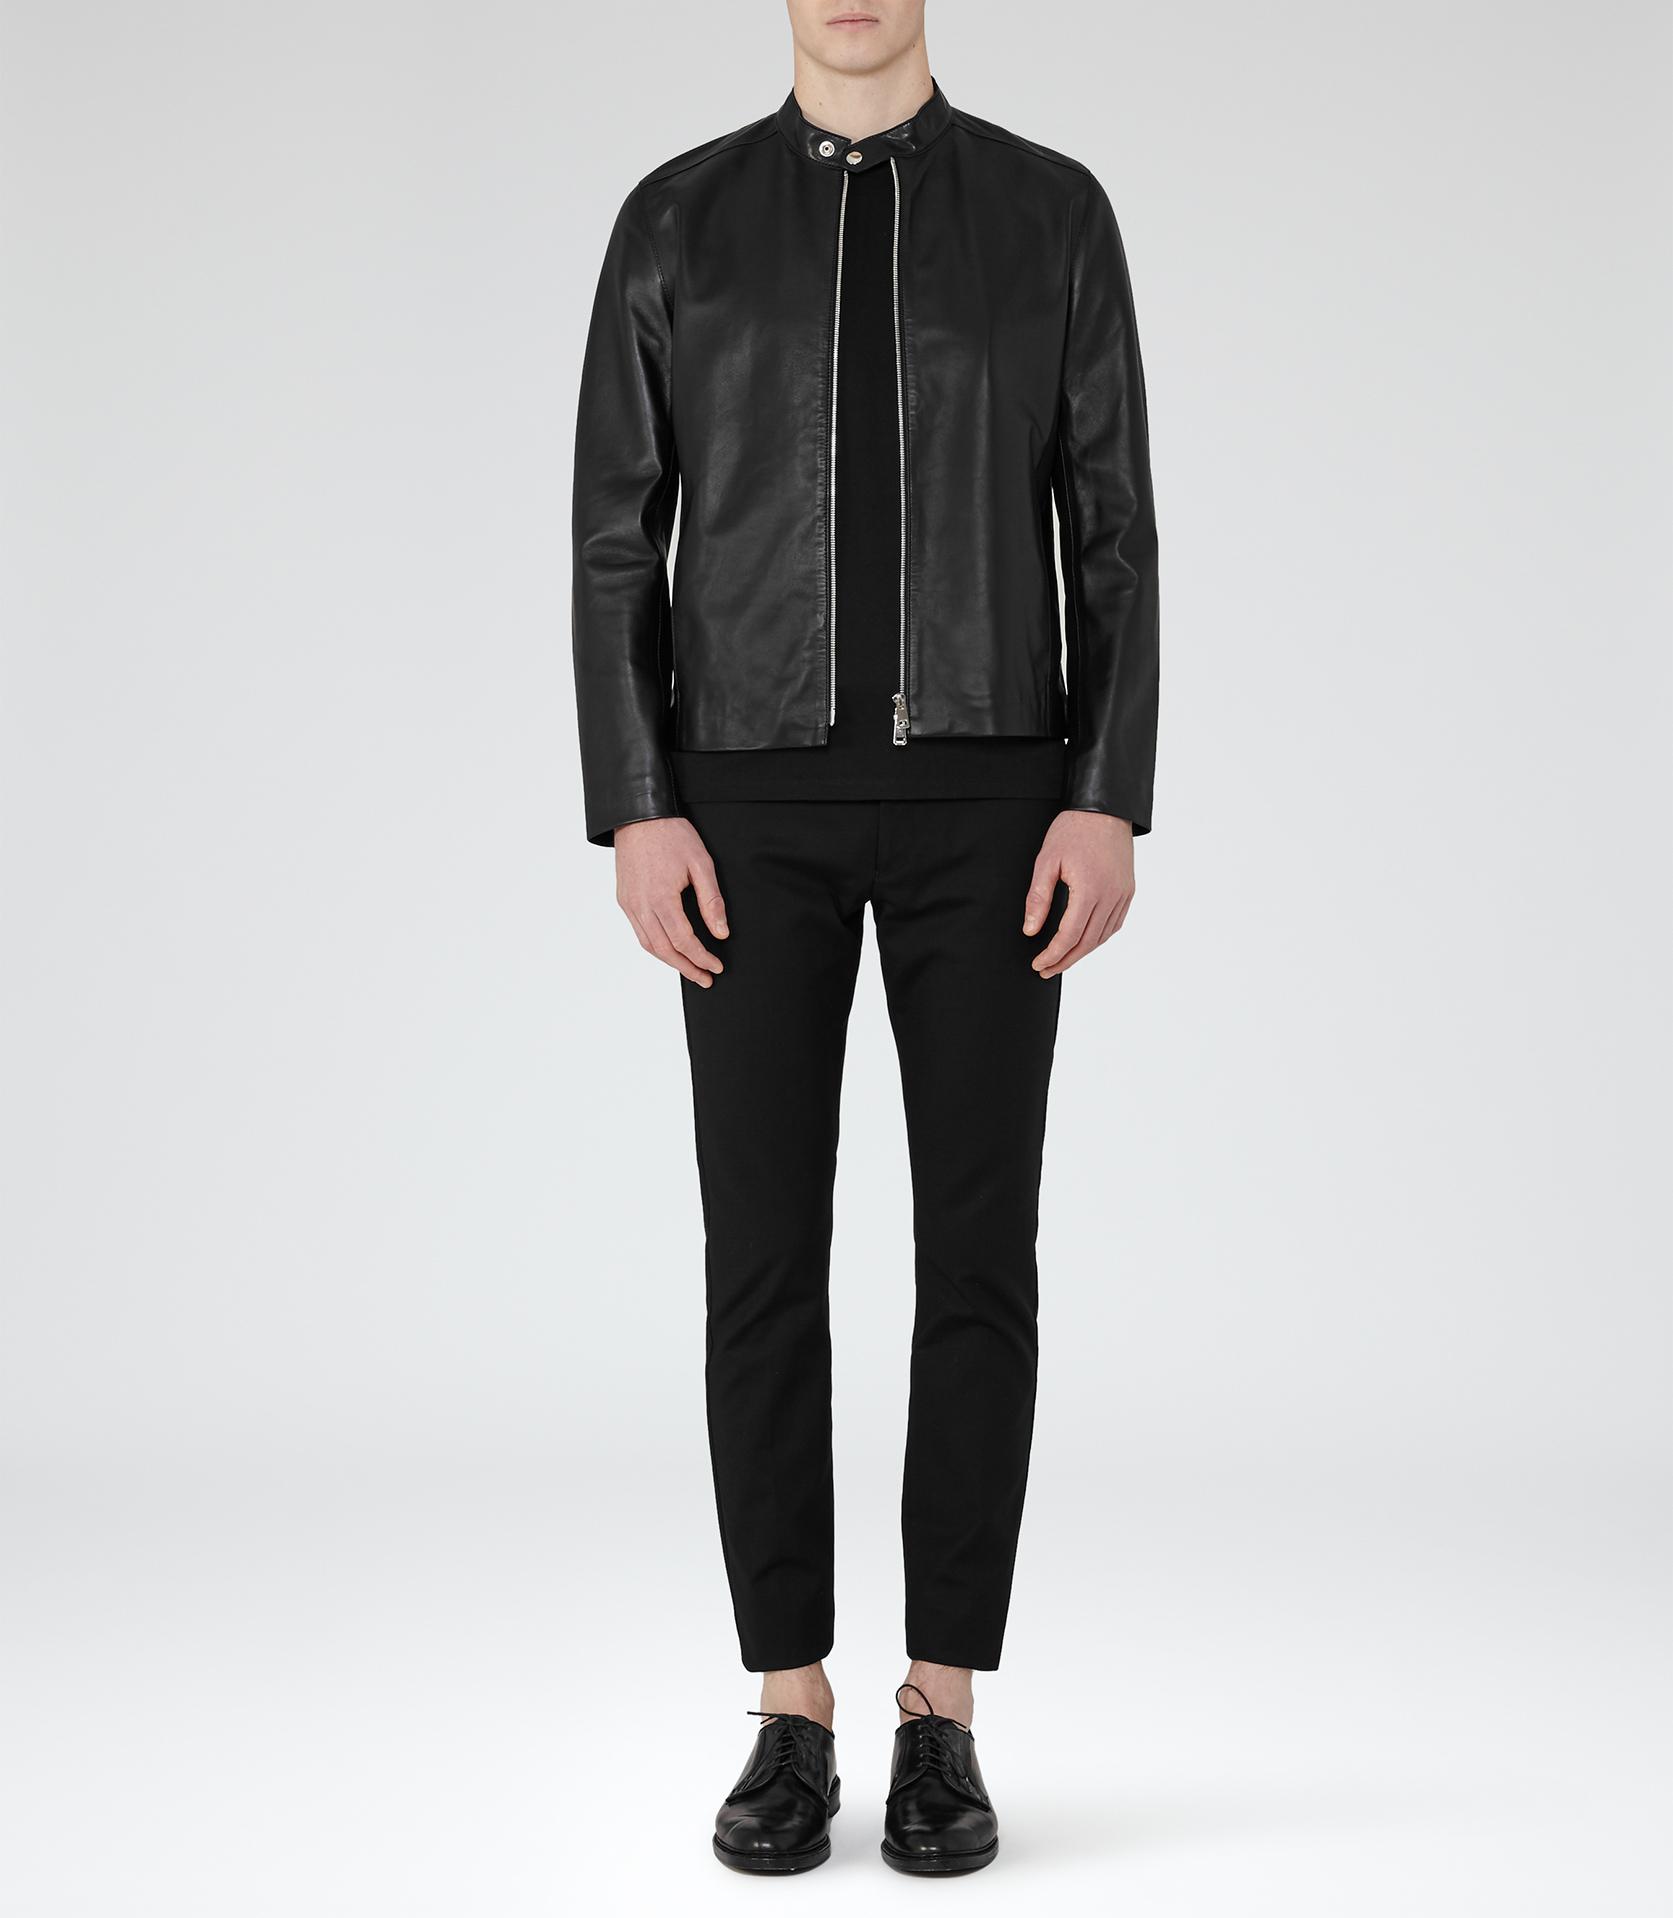 Reiss Brooklyn Leather Jacket in Black for Men